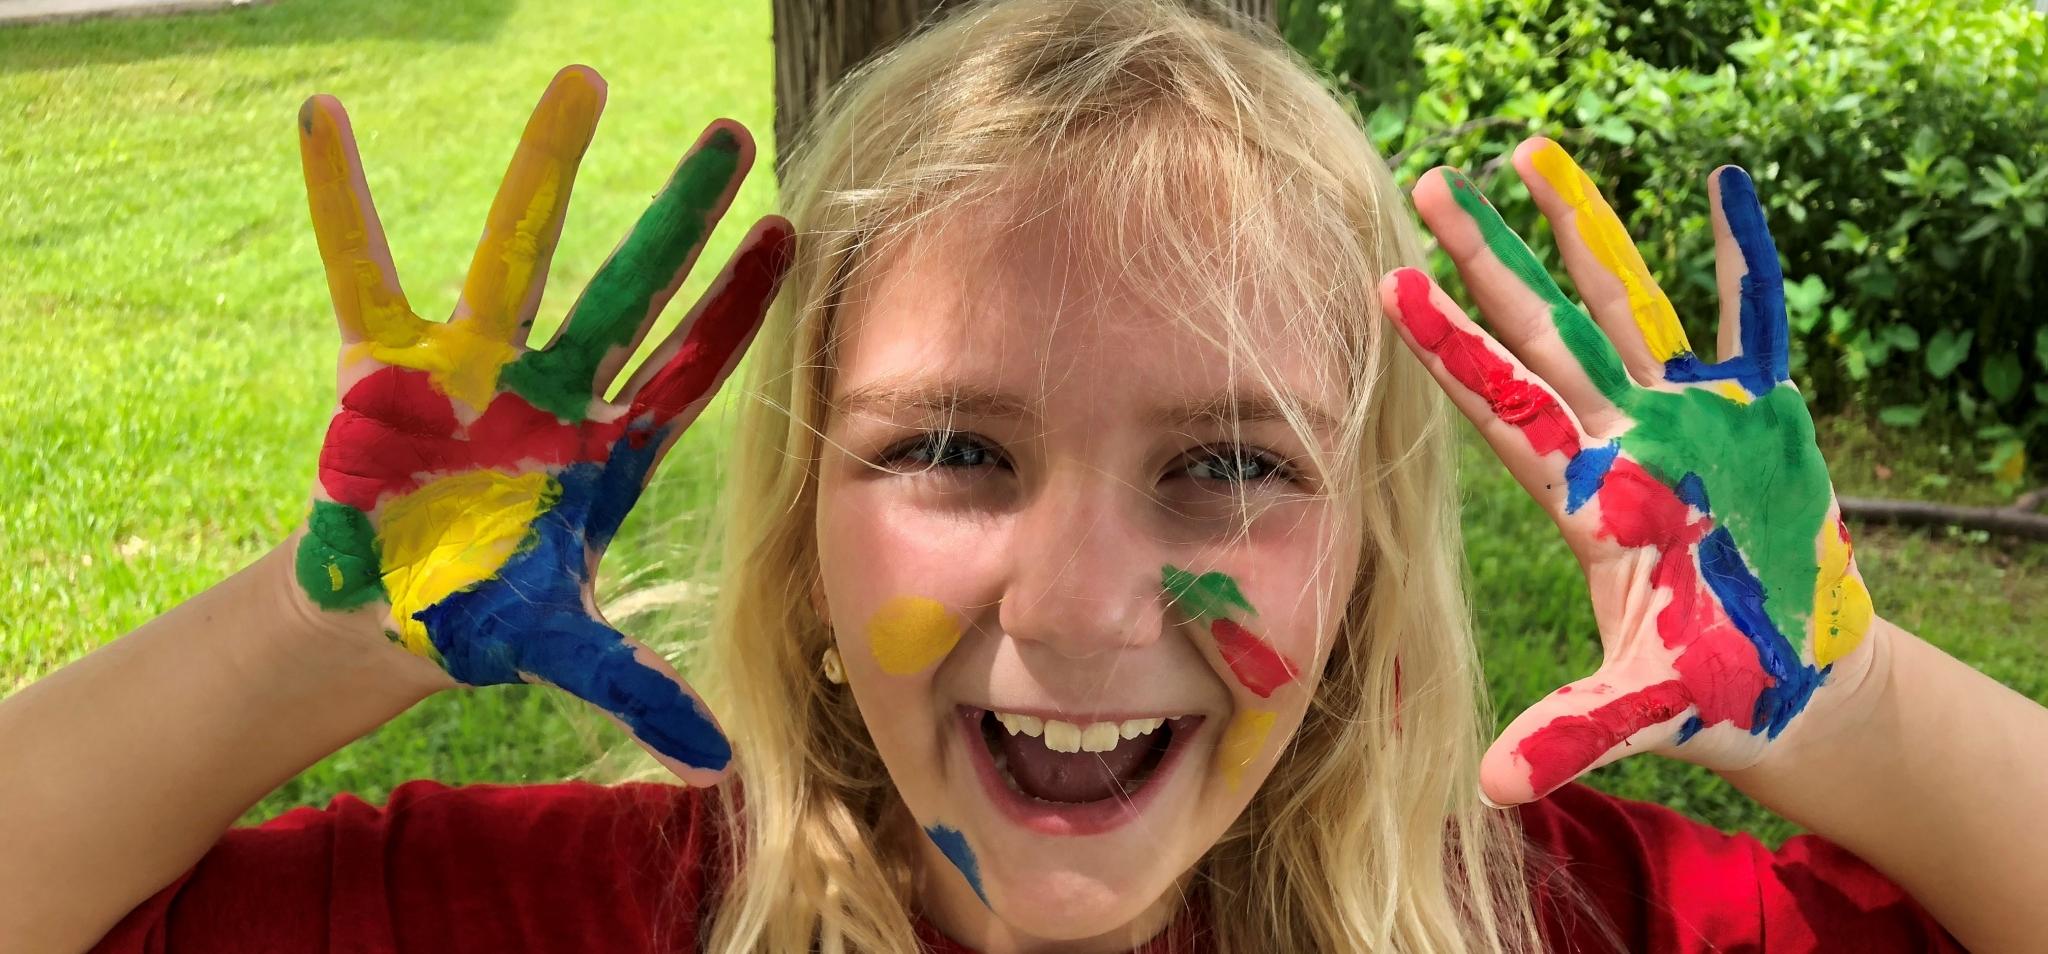 KidzArt: WEEK 1 Art in the Afternoon Summer Camp